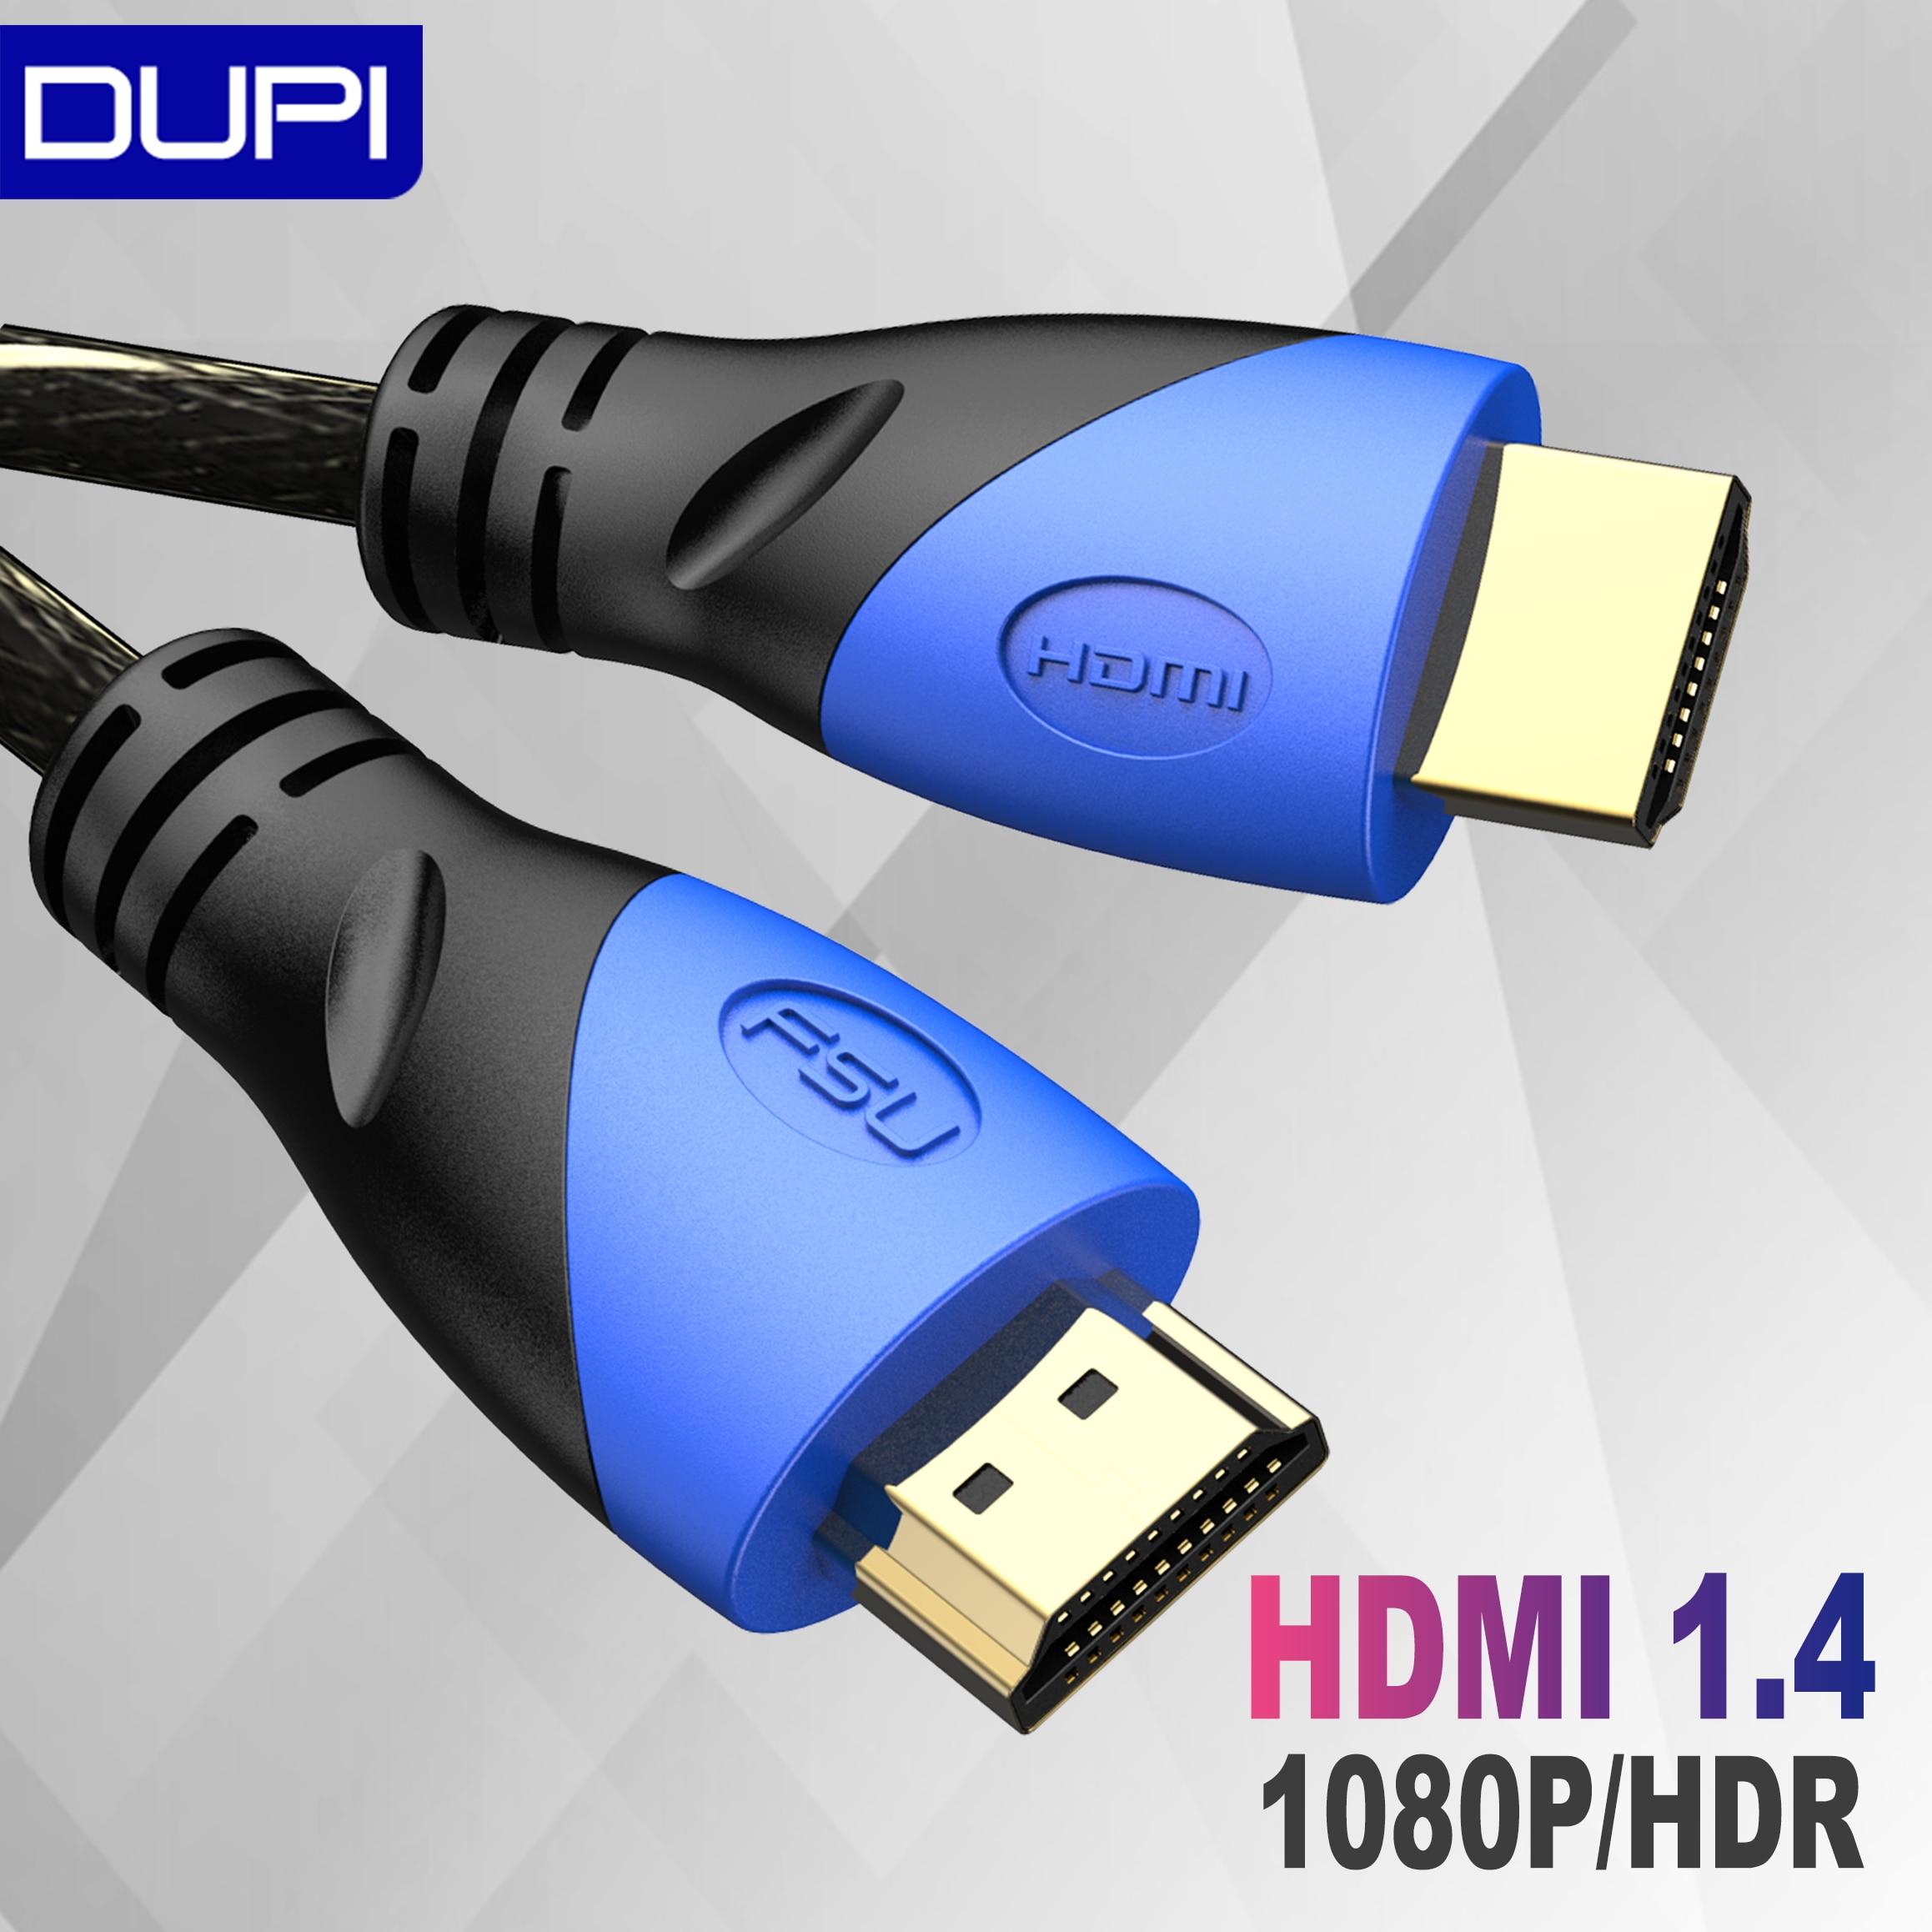 Adaptador de interruptor de Cable HDMI de nailon trenzado 1M 3M 5M 8M cable HDMI 1080P 3D para PS4 Xbox proyector TV PC ordenador portátil Cable HDMI